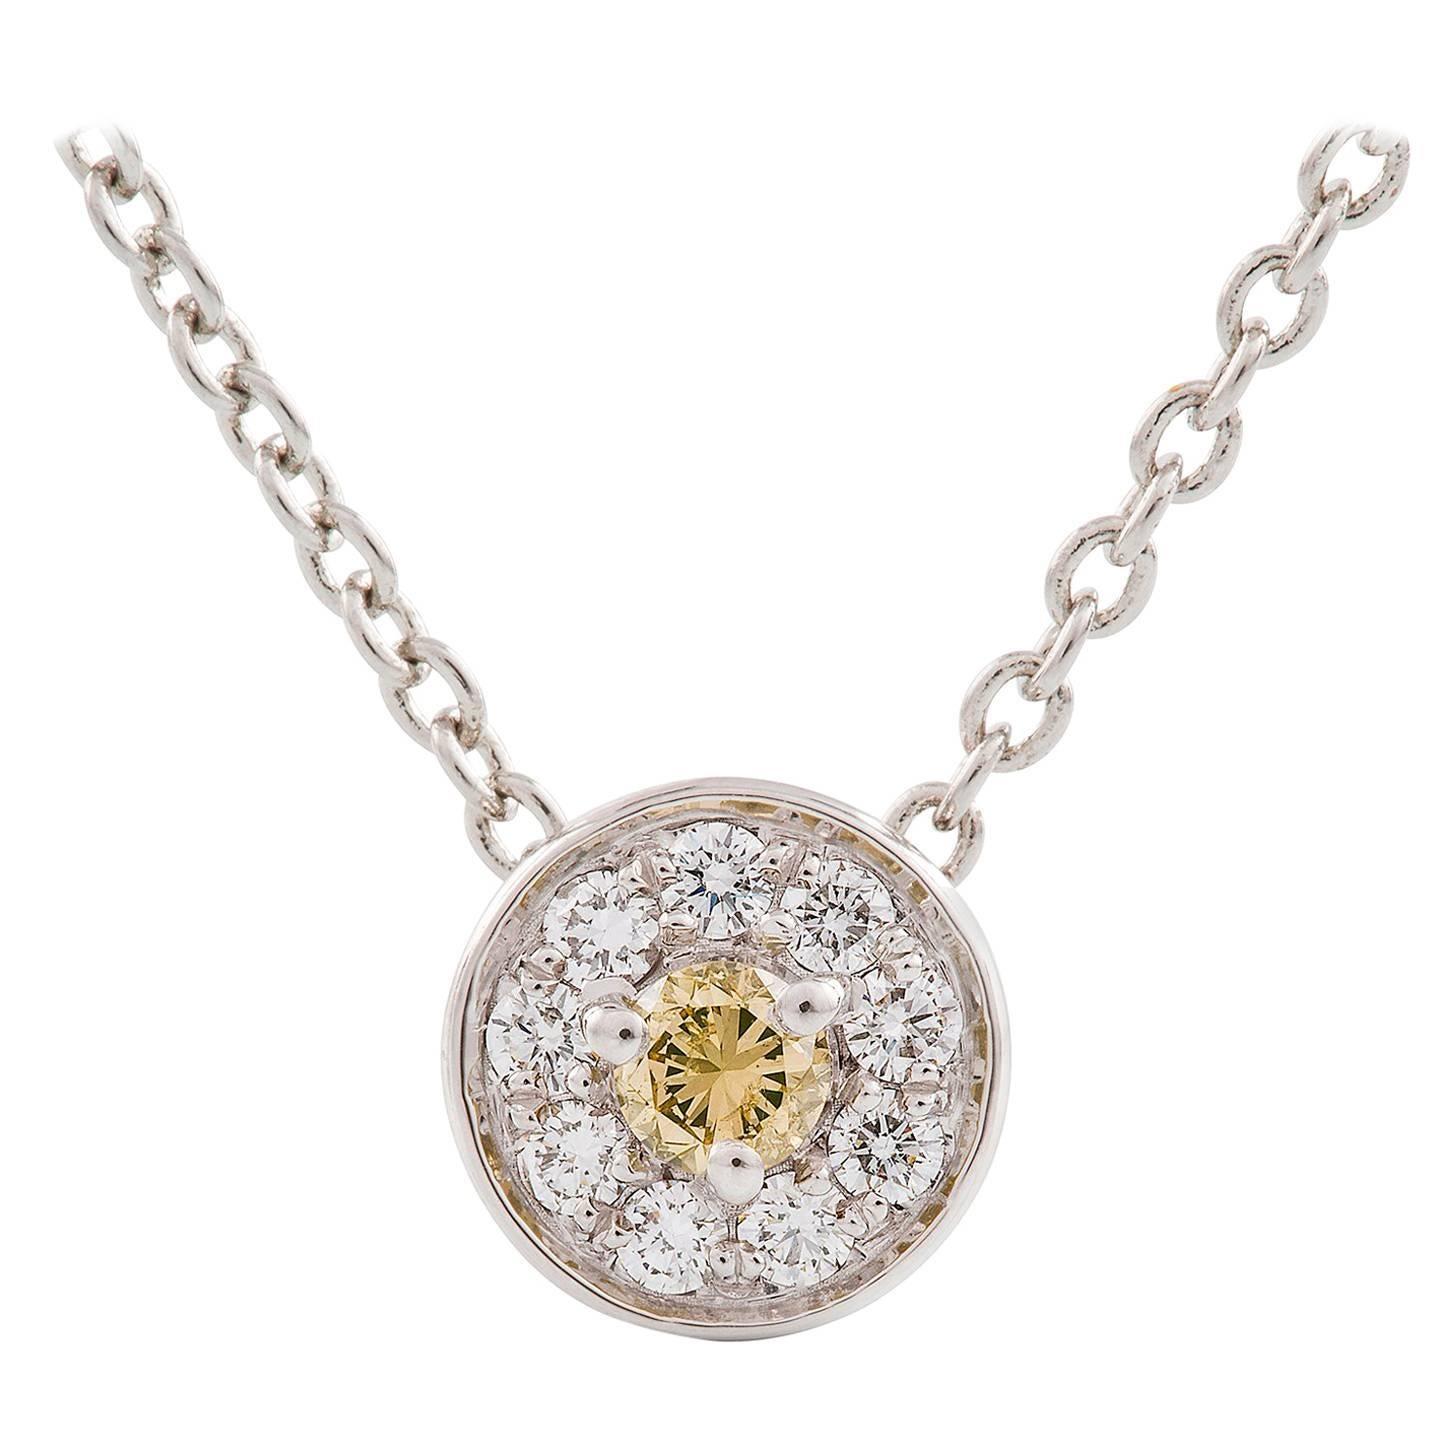 Kian Design 18 Carat White Gold, Round Brilliant Cut Cluster Diamond Necklace